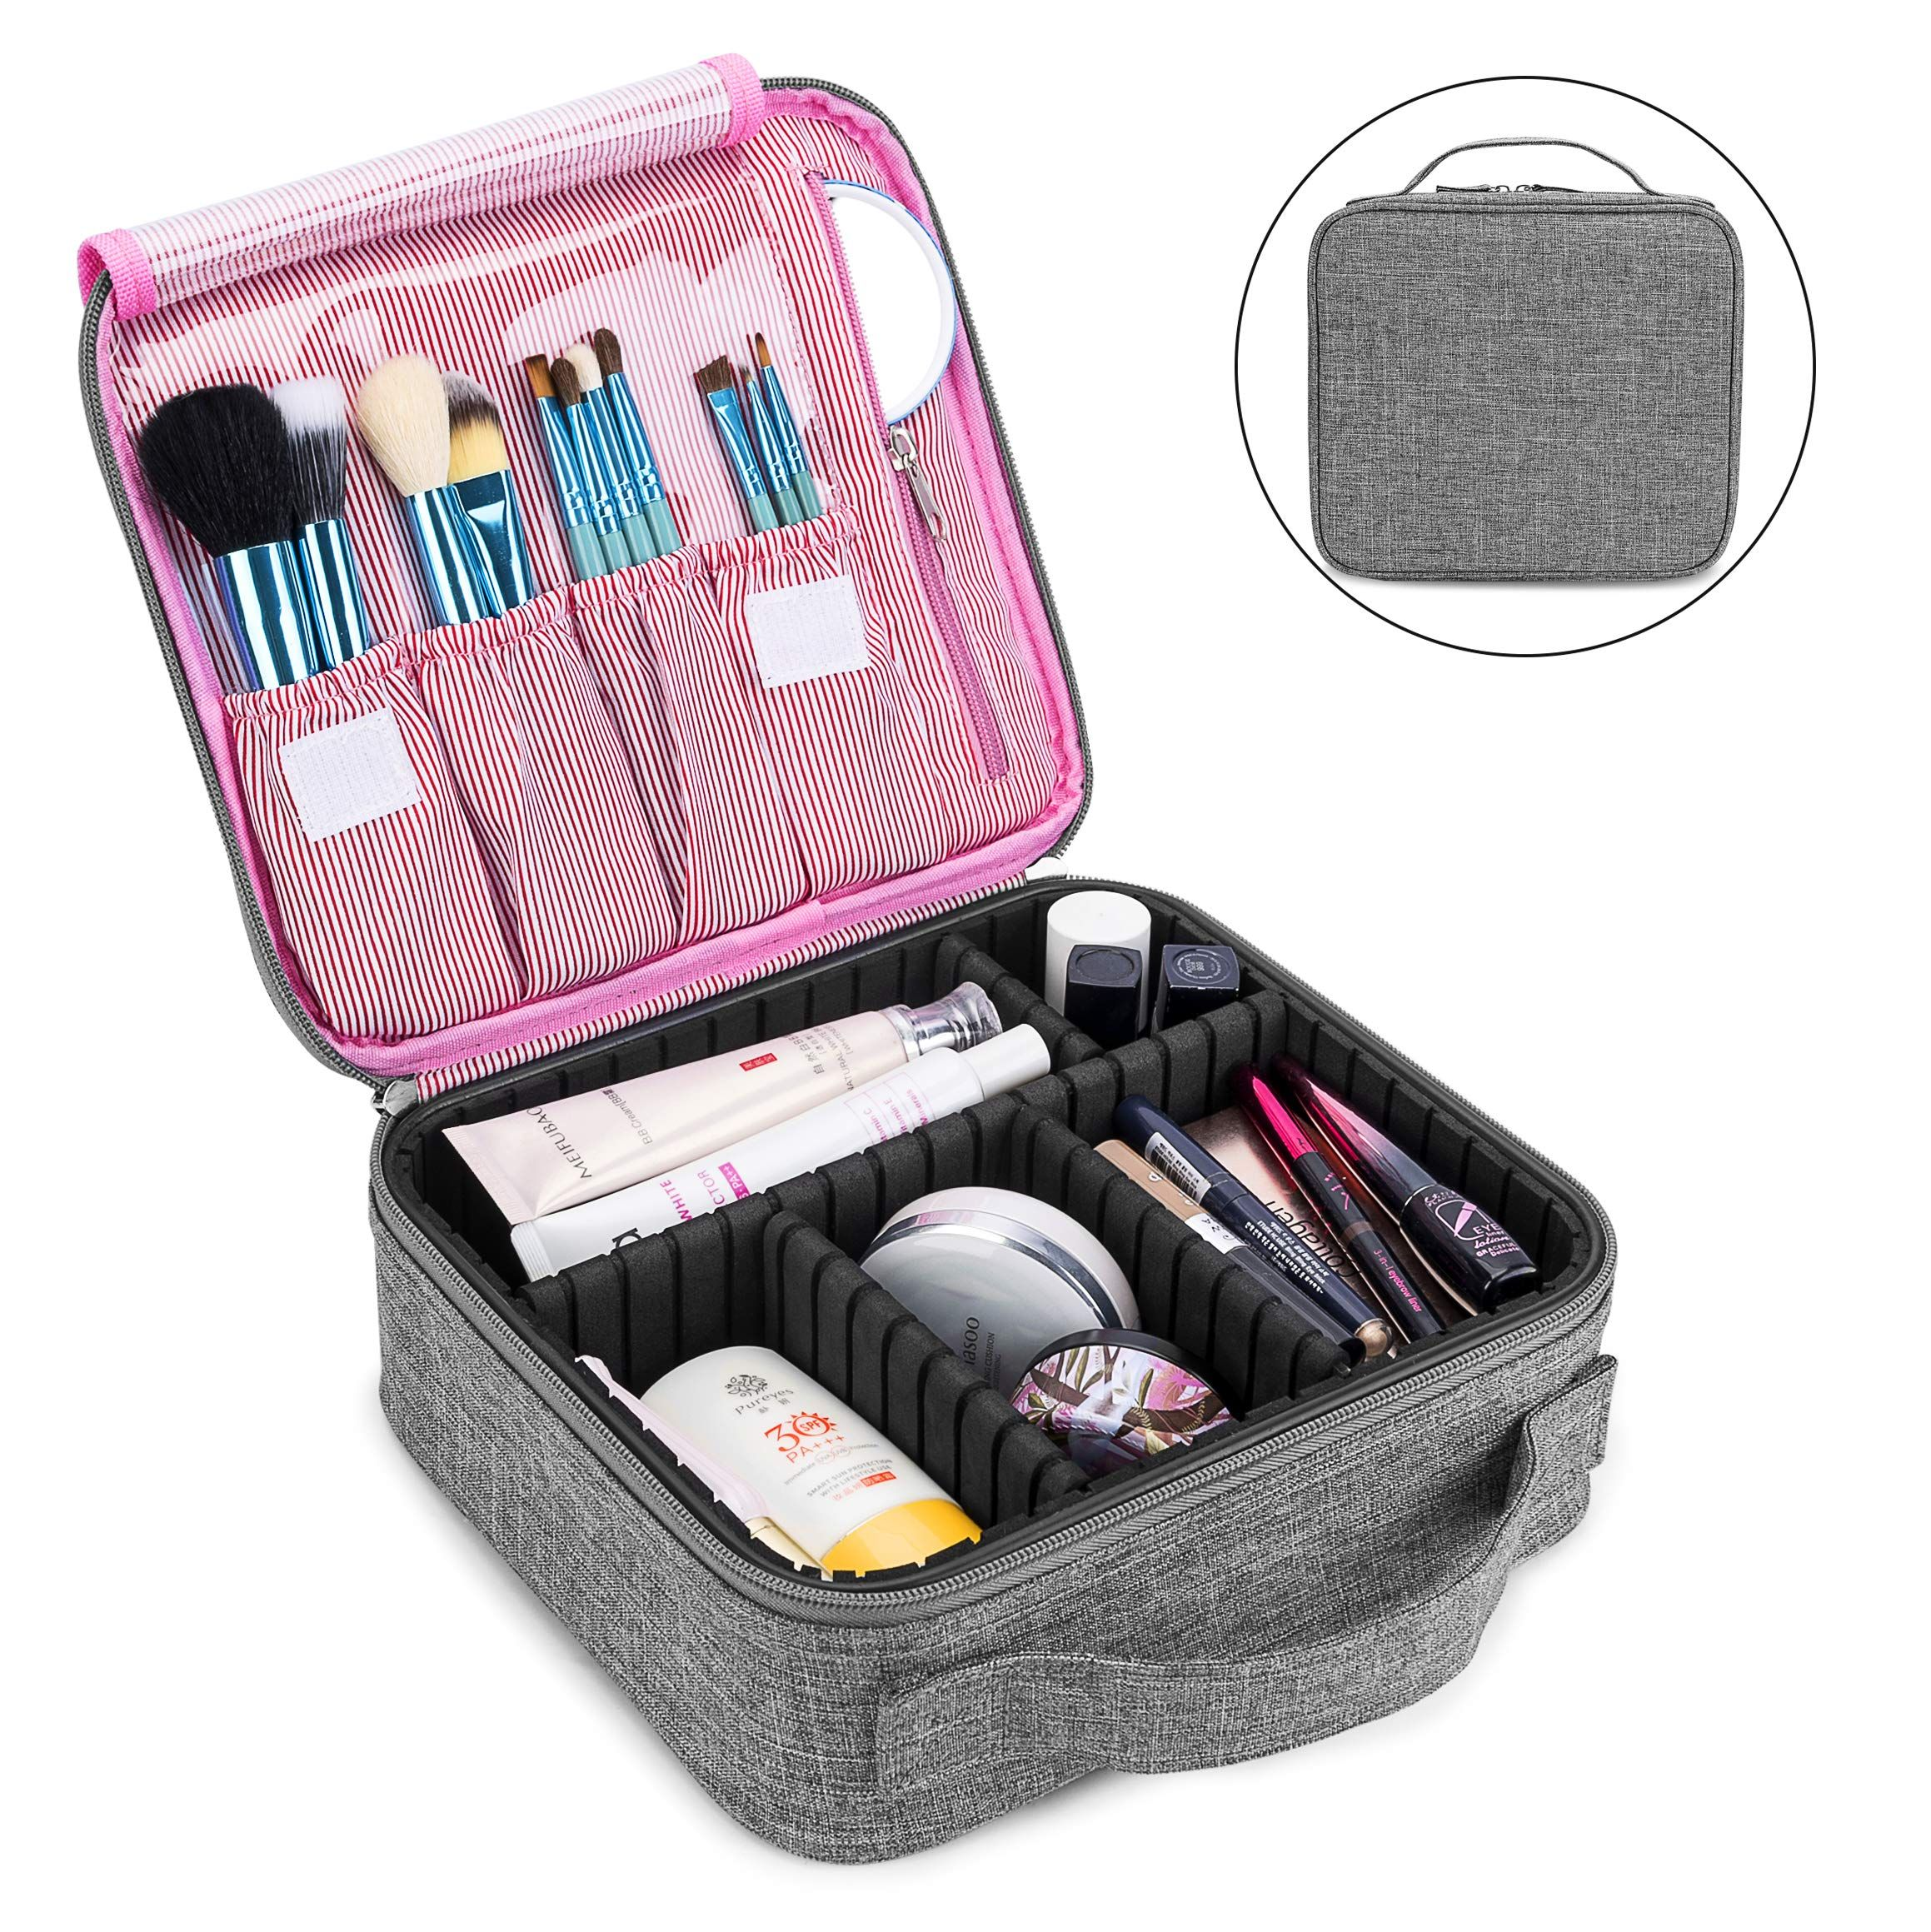 bf2ab4007647 Amazon.com : Makeup Bag Travel Cosmetic Bag for Women Nylon Cute ...